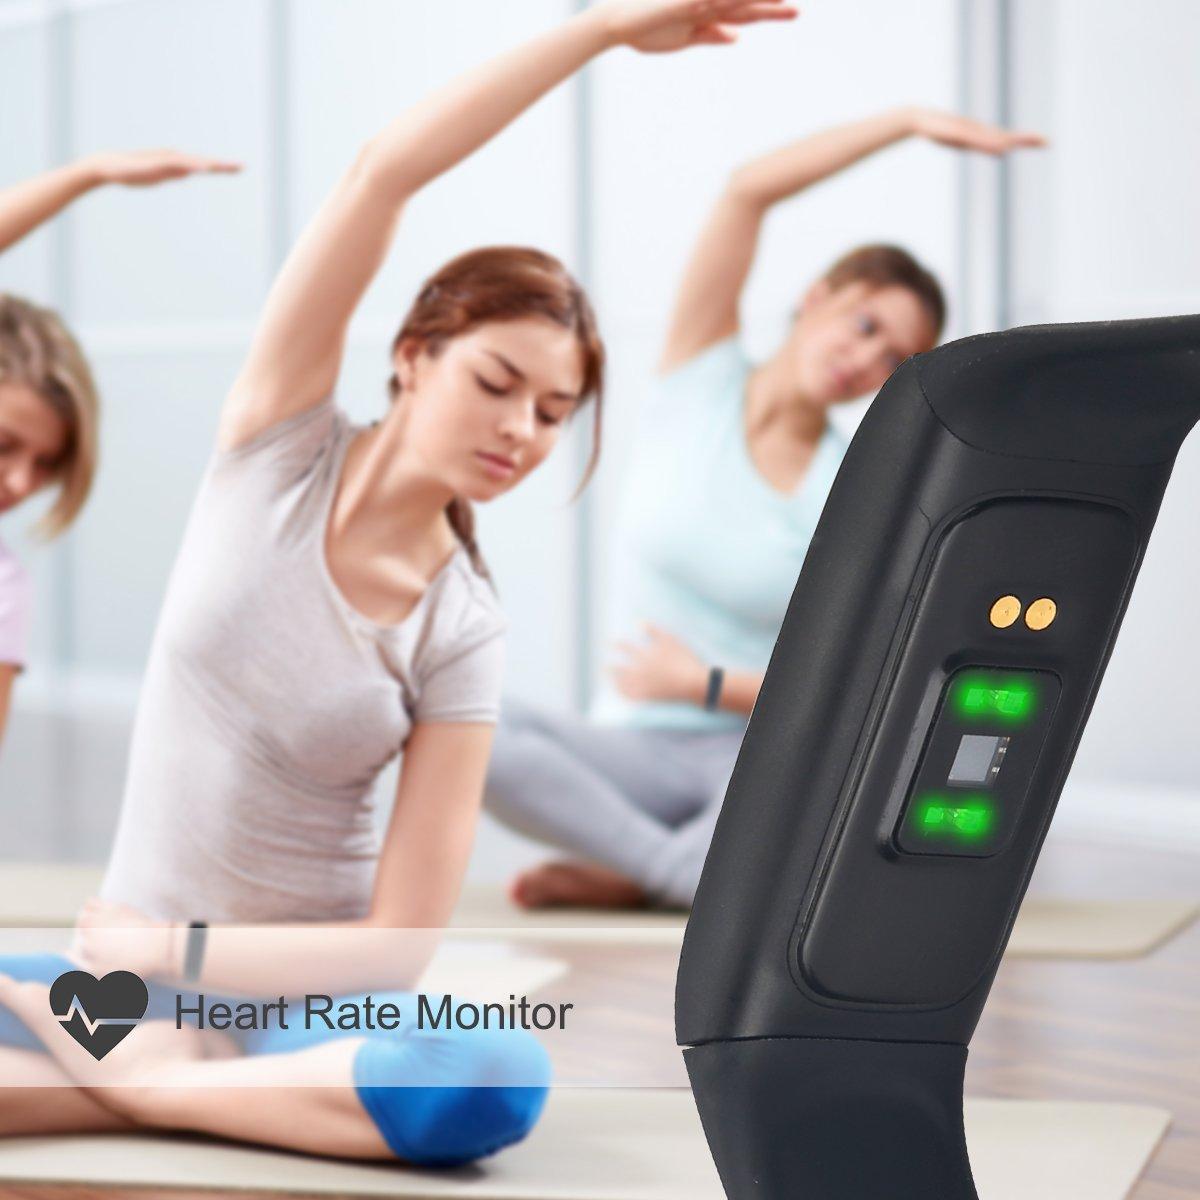 Fitness Tracker Ikustar Smart Bracelet Pedometer Heart Heartratenotesforbasiccircuittrainingjpg Rate Monitor Sleep Calorie Counter Sport Activity With Hd Oled